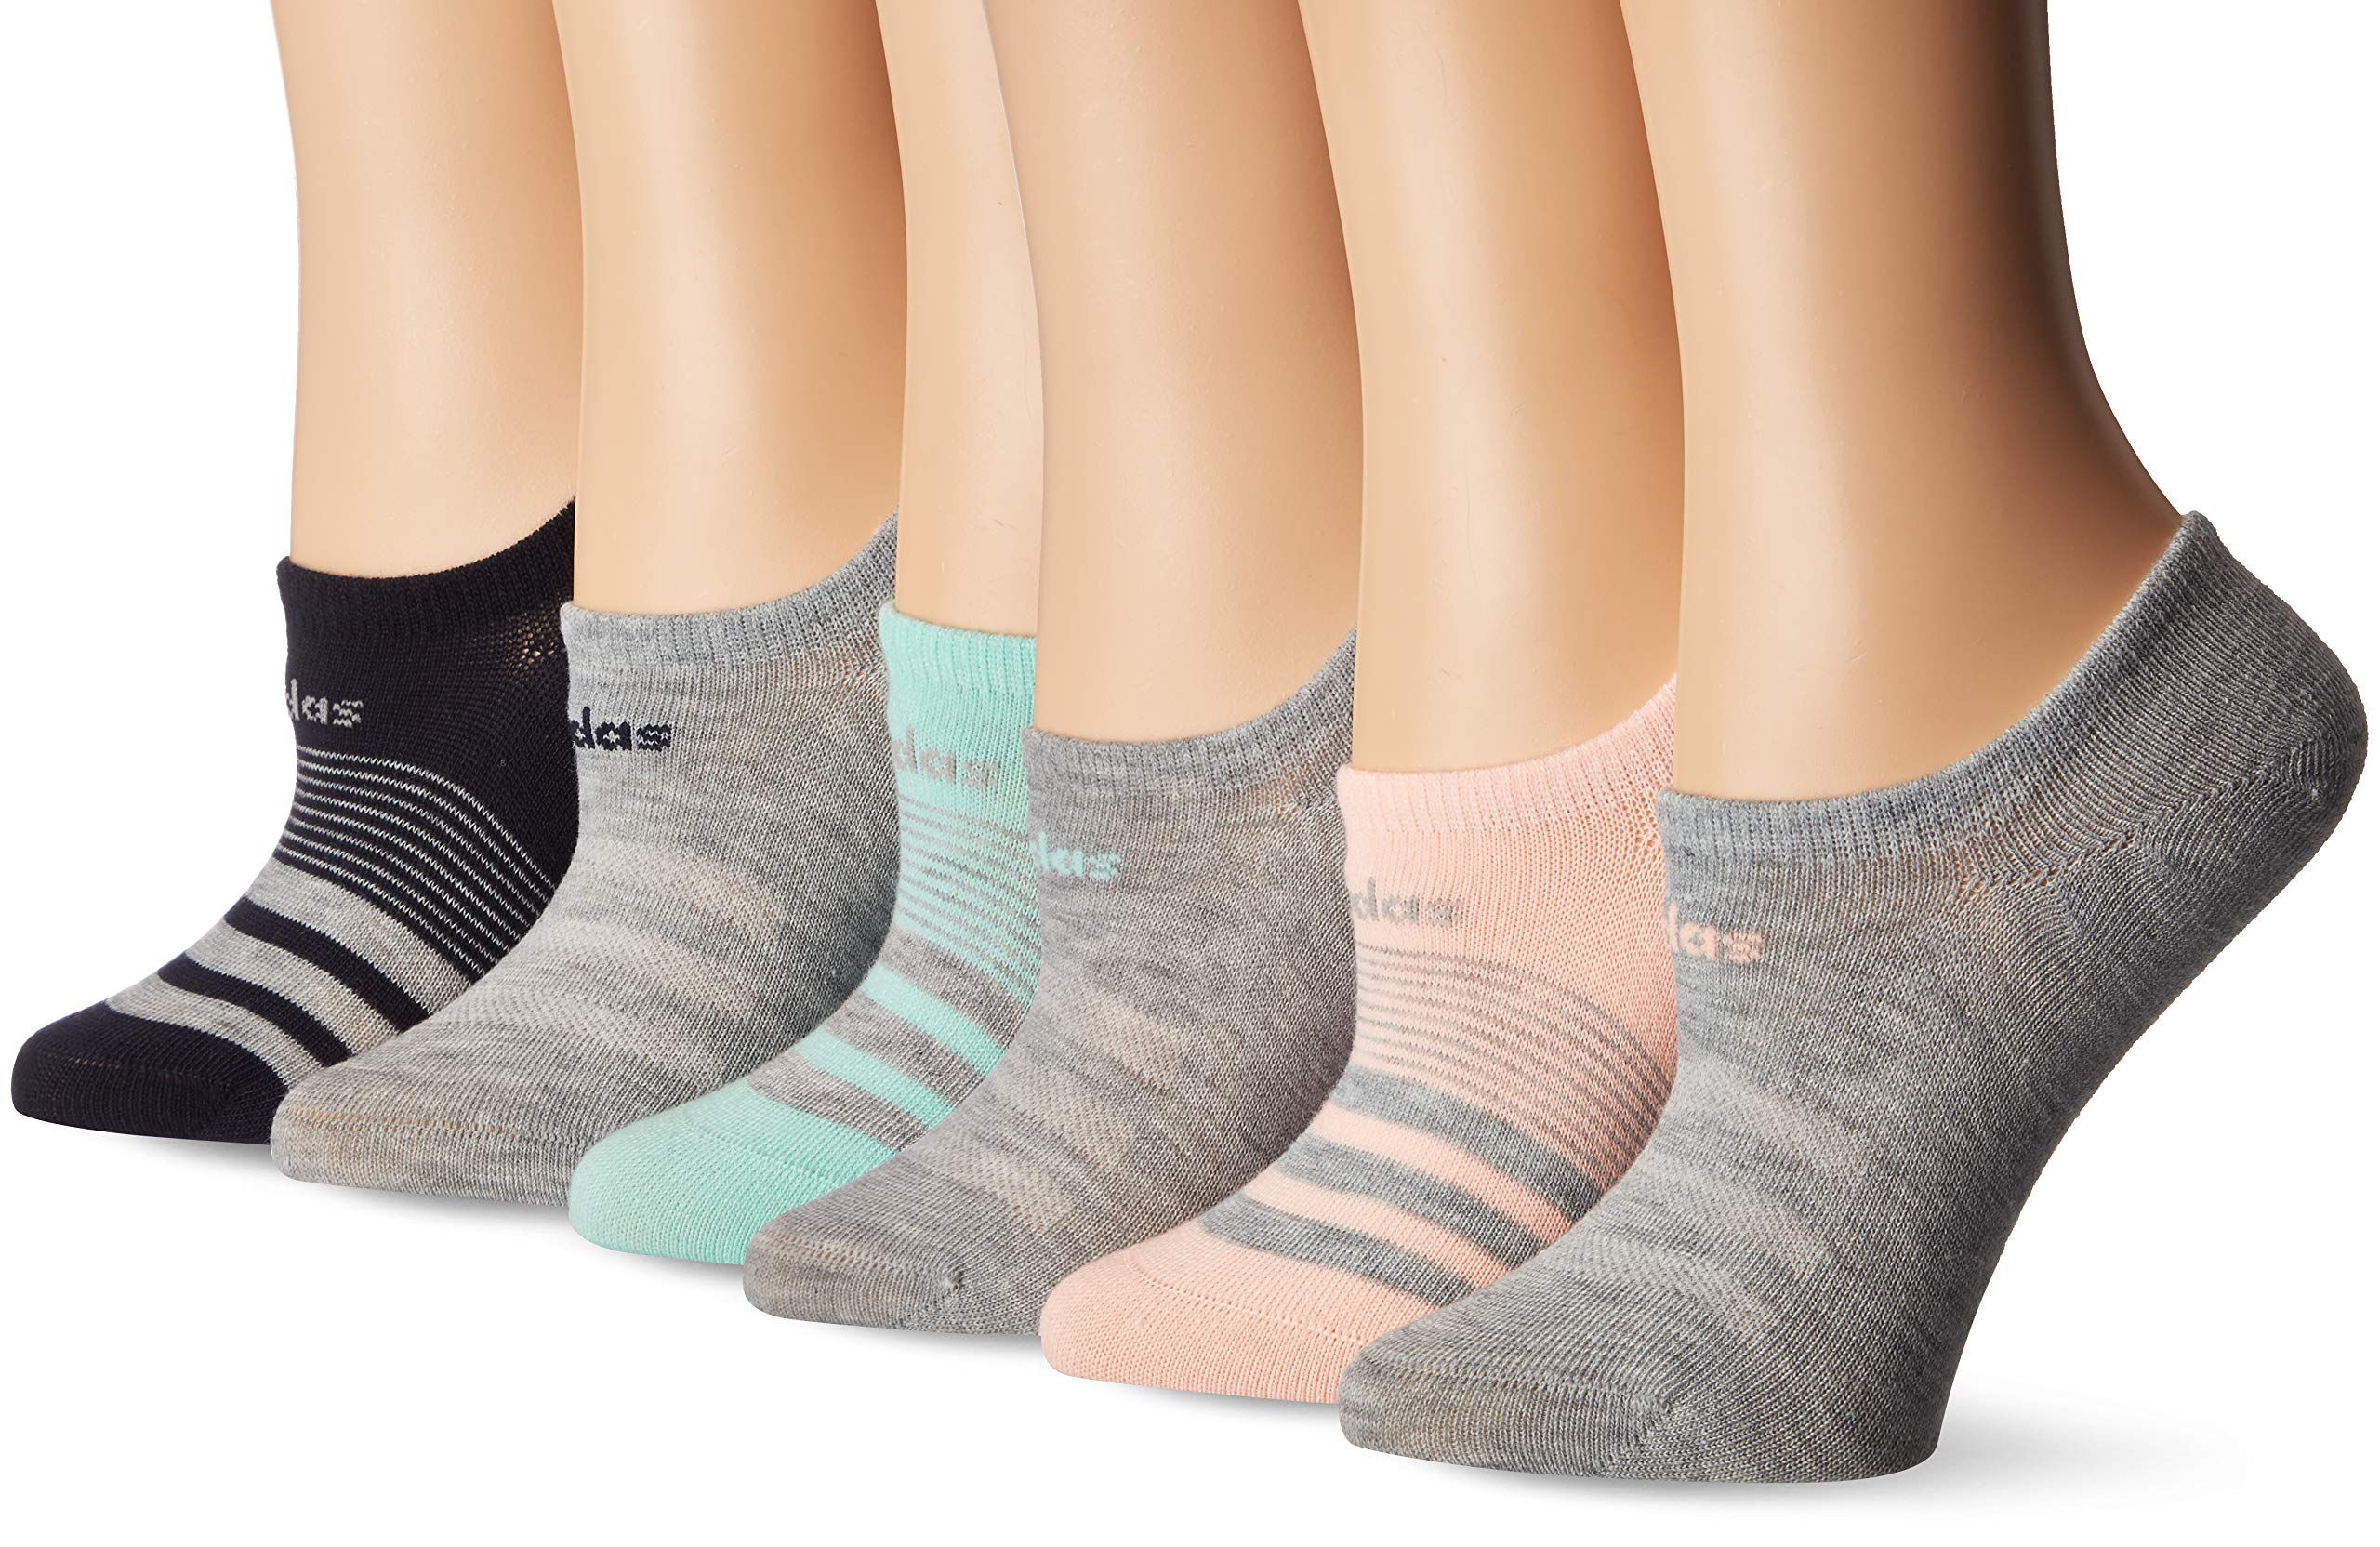 adidas Women's Superlite Super No Show Socks (6-Pair), Clear Orange/Light Heather Grey/Clear Mint/Legend, Medium, (Shoe Size 5-10) by adidas